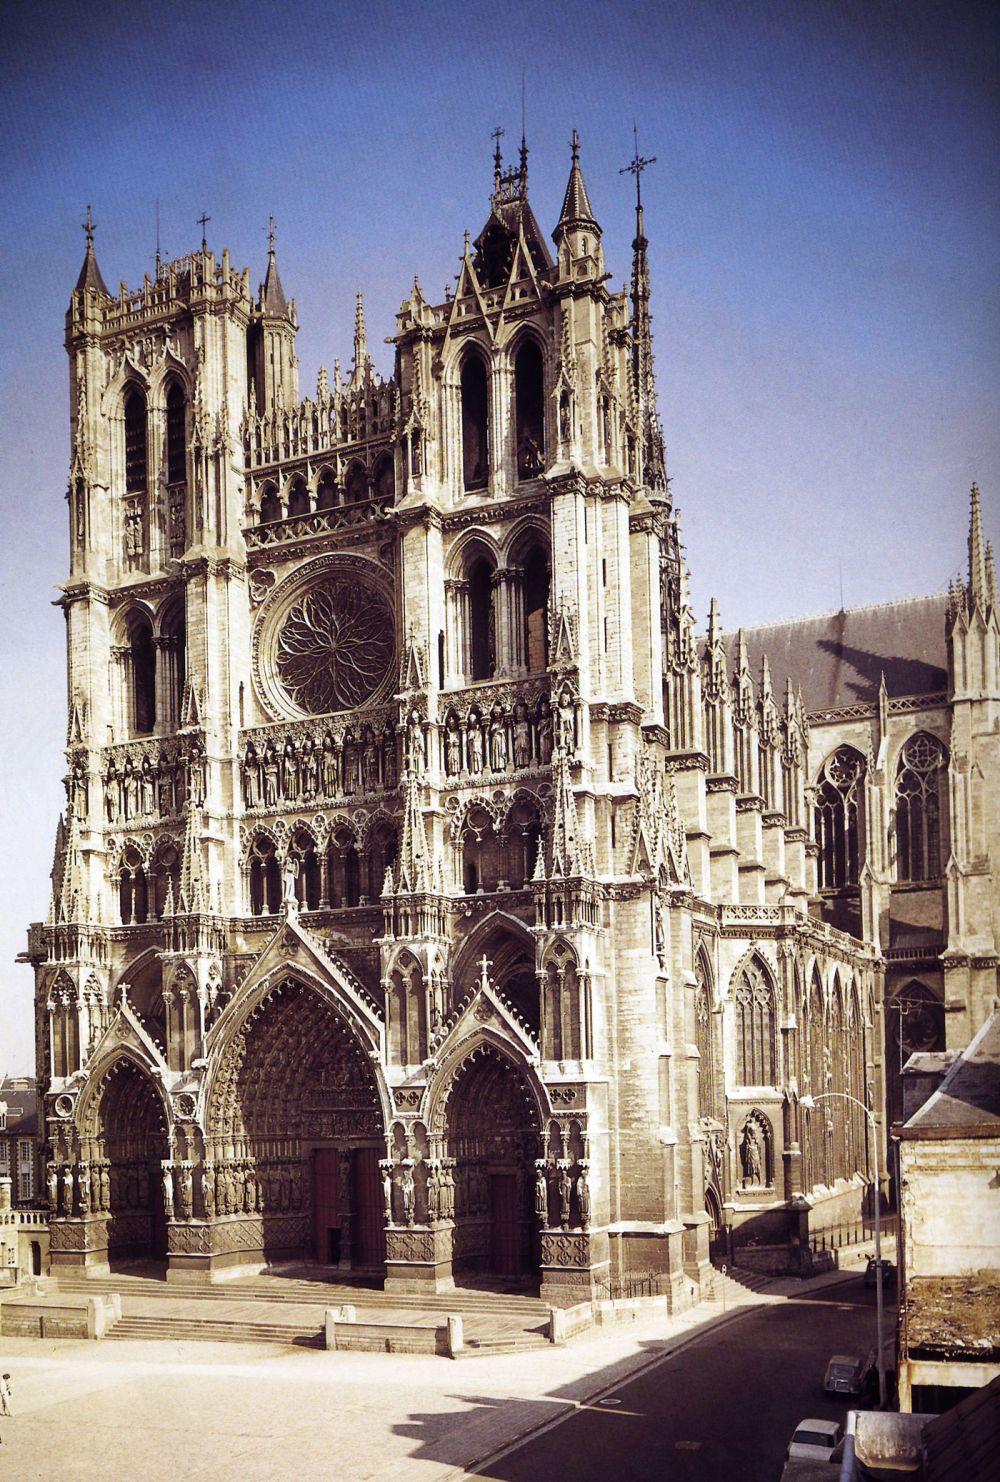 Talleres de Arquitectura en la Edad Media Facciata della Cattedrale di Amiens